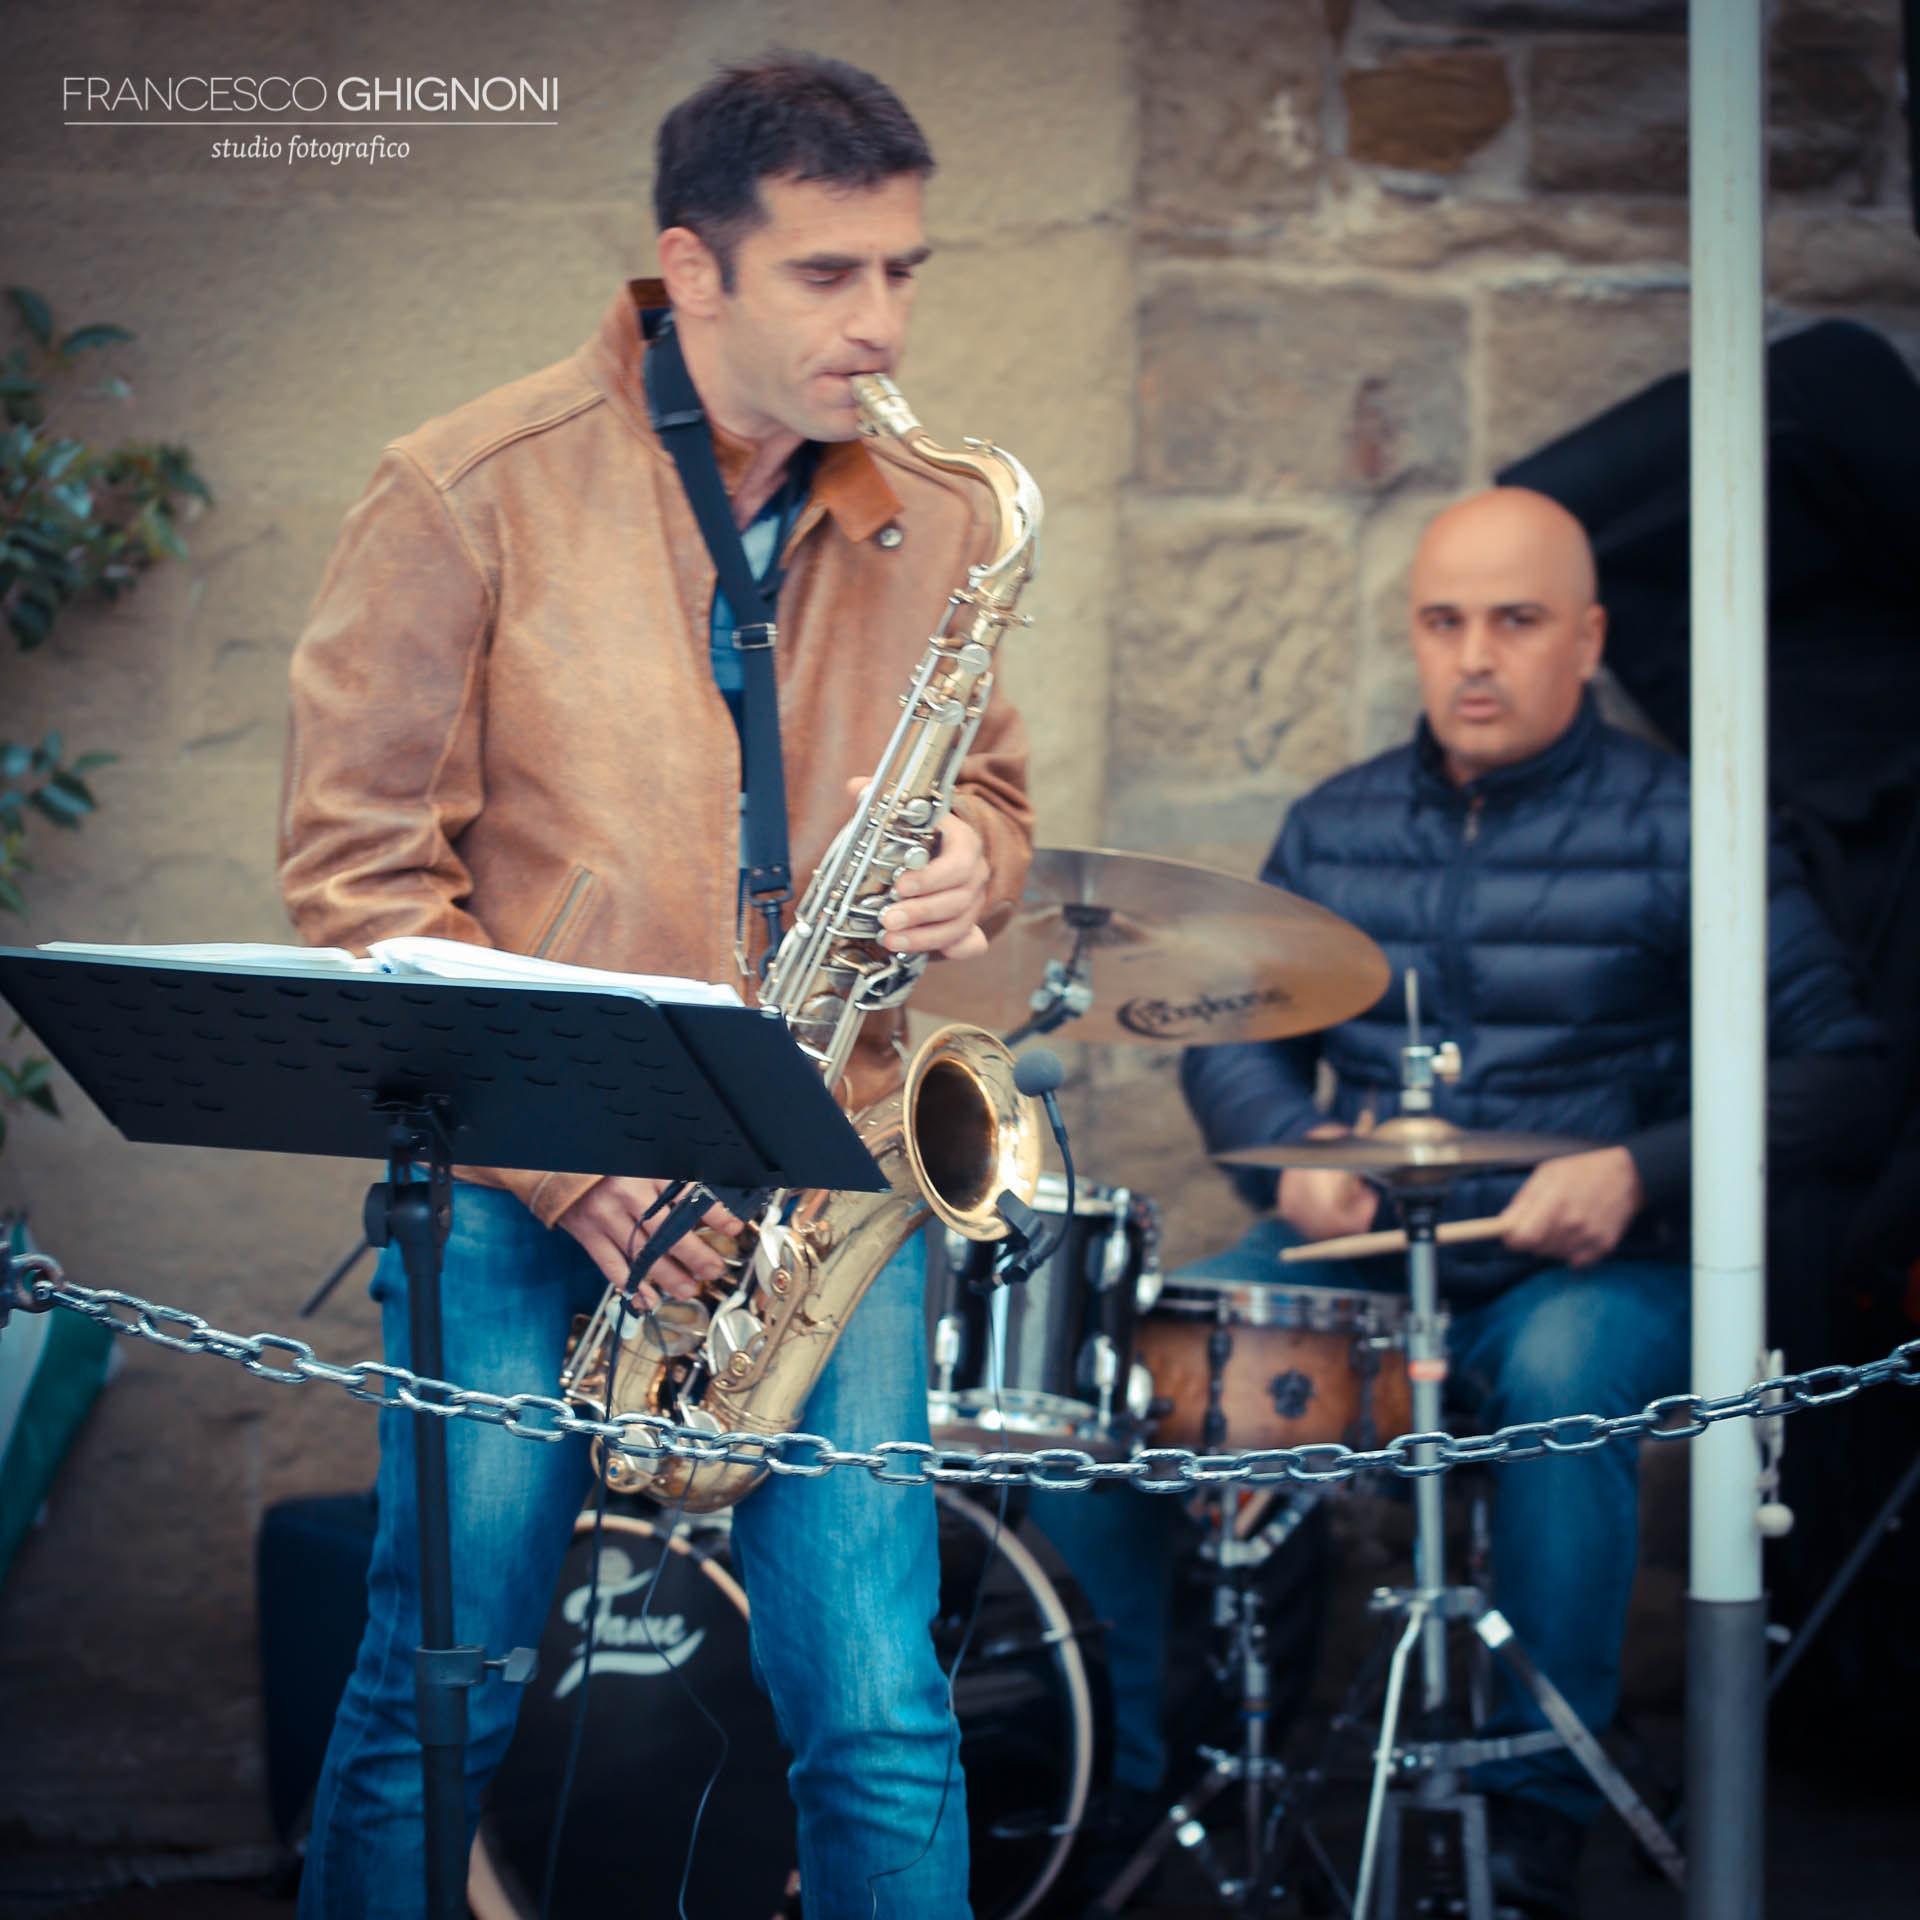 140427170023 - Foto Francesco Ghignoni